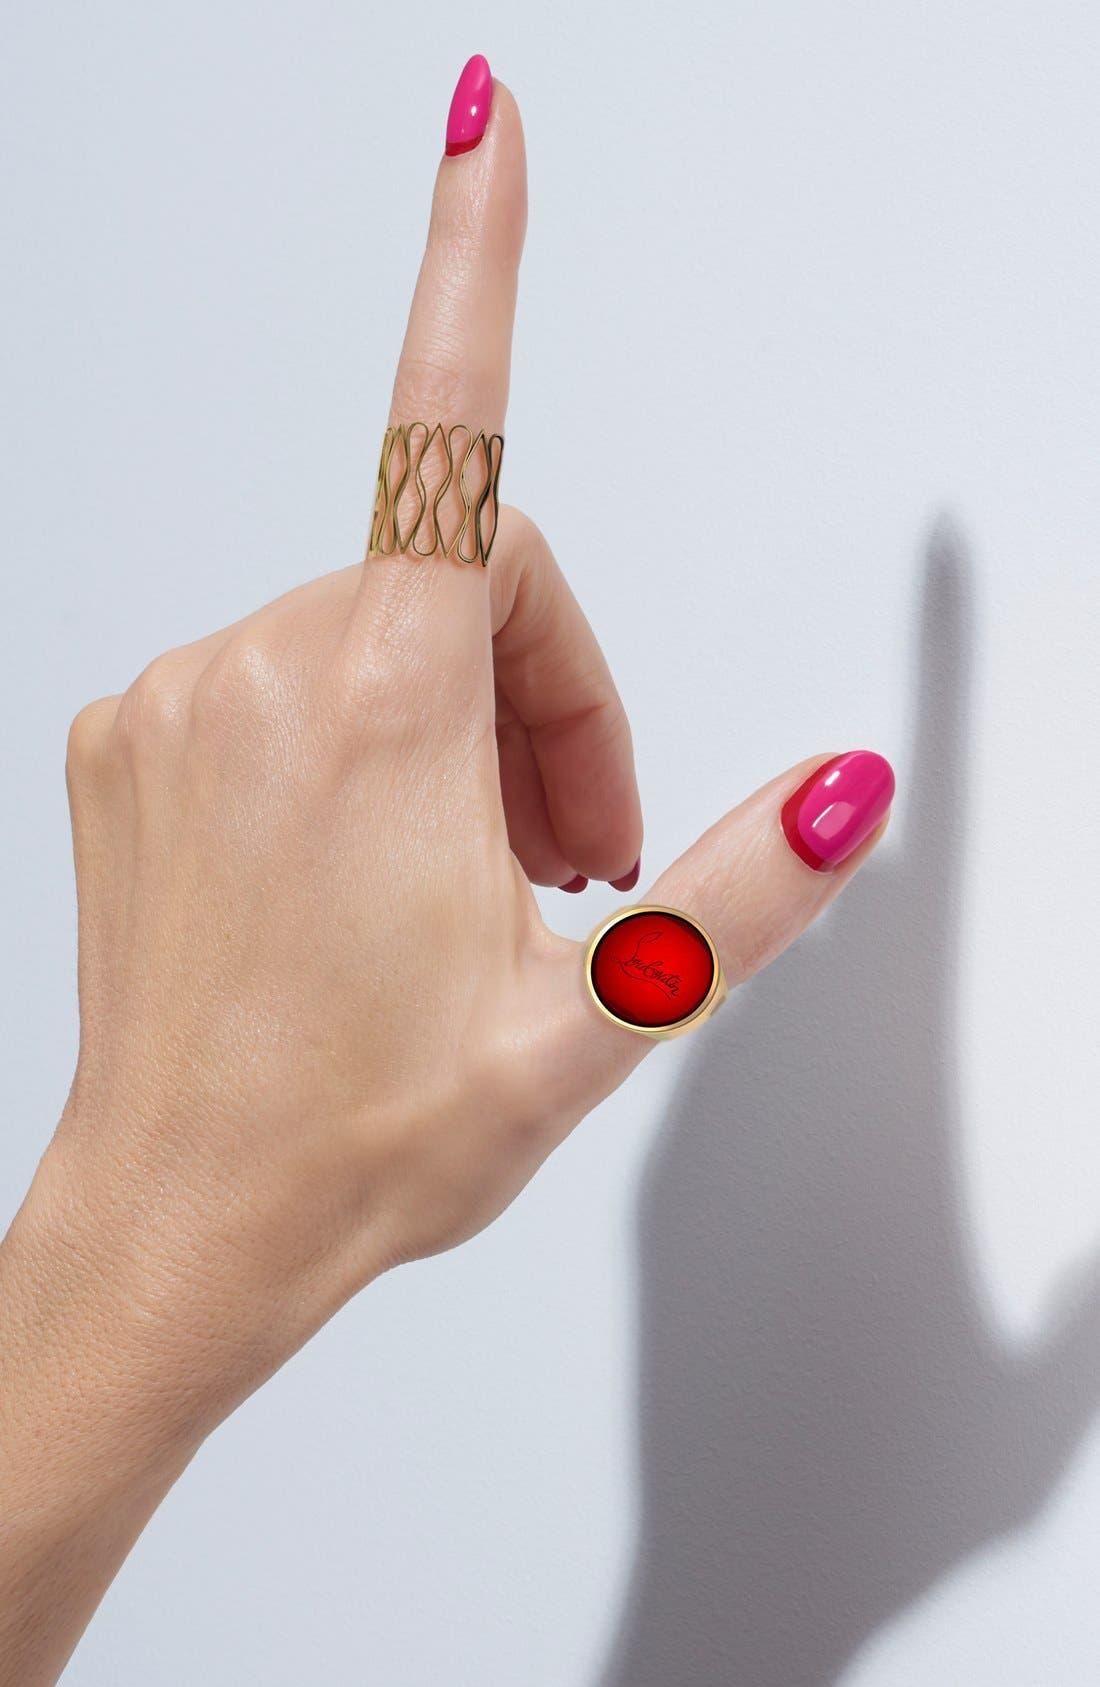 Christian Louboutin 'Apostrophe' Manicure